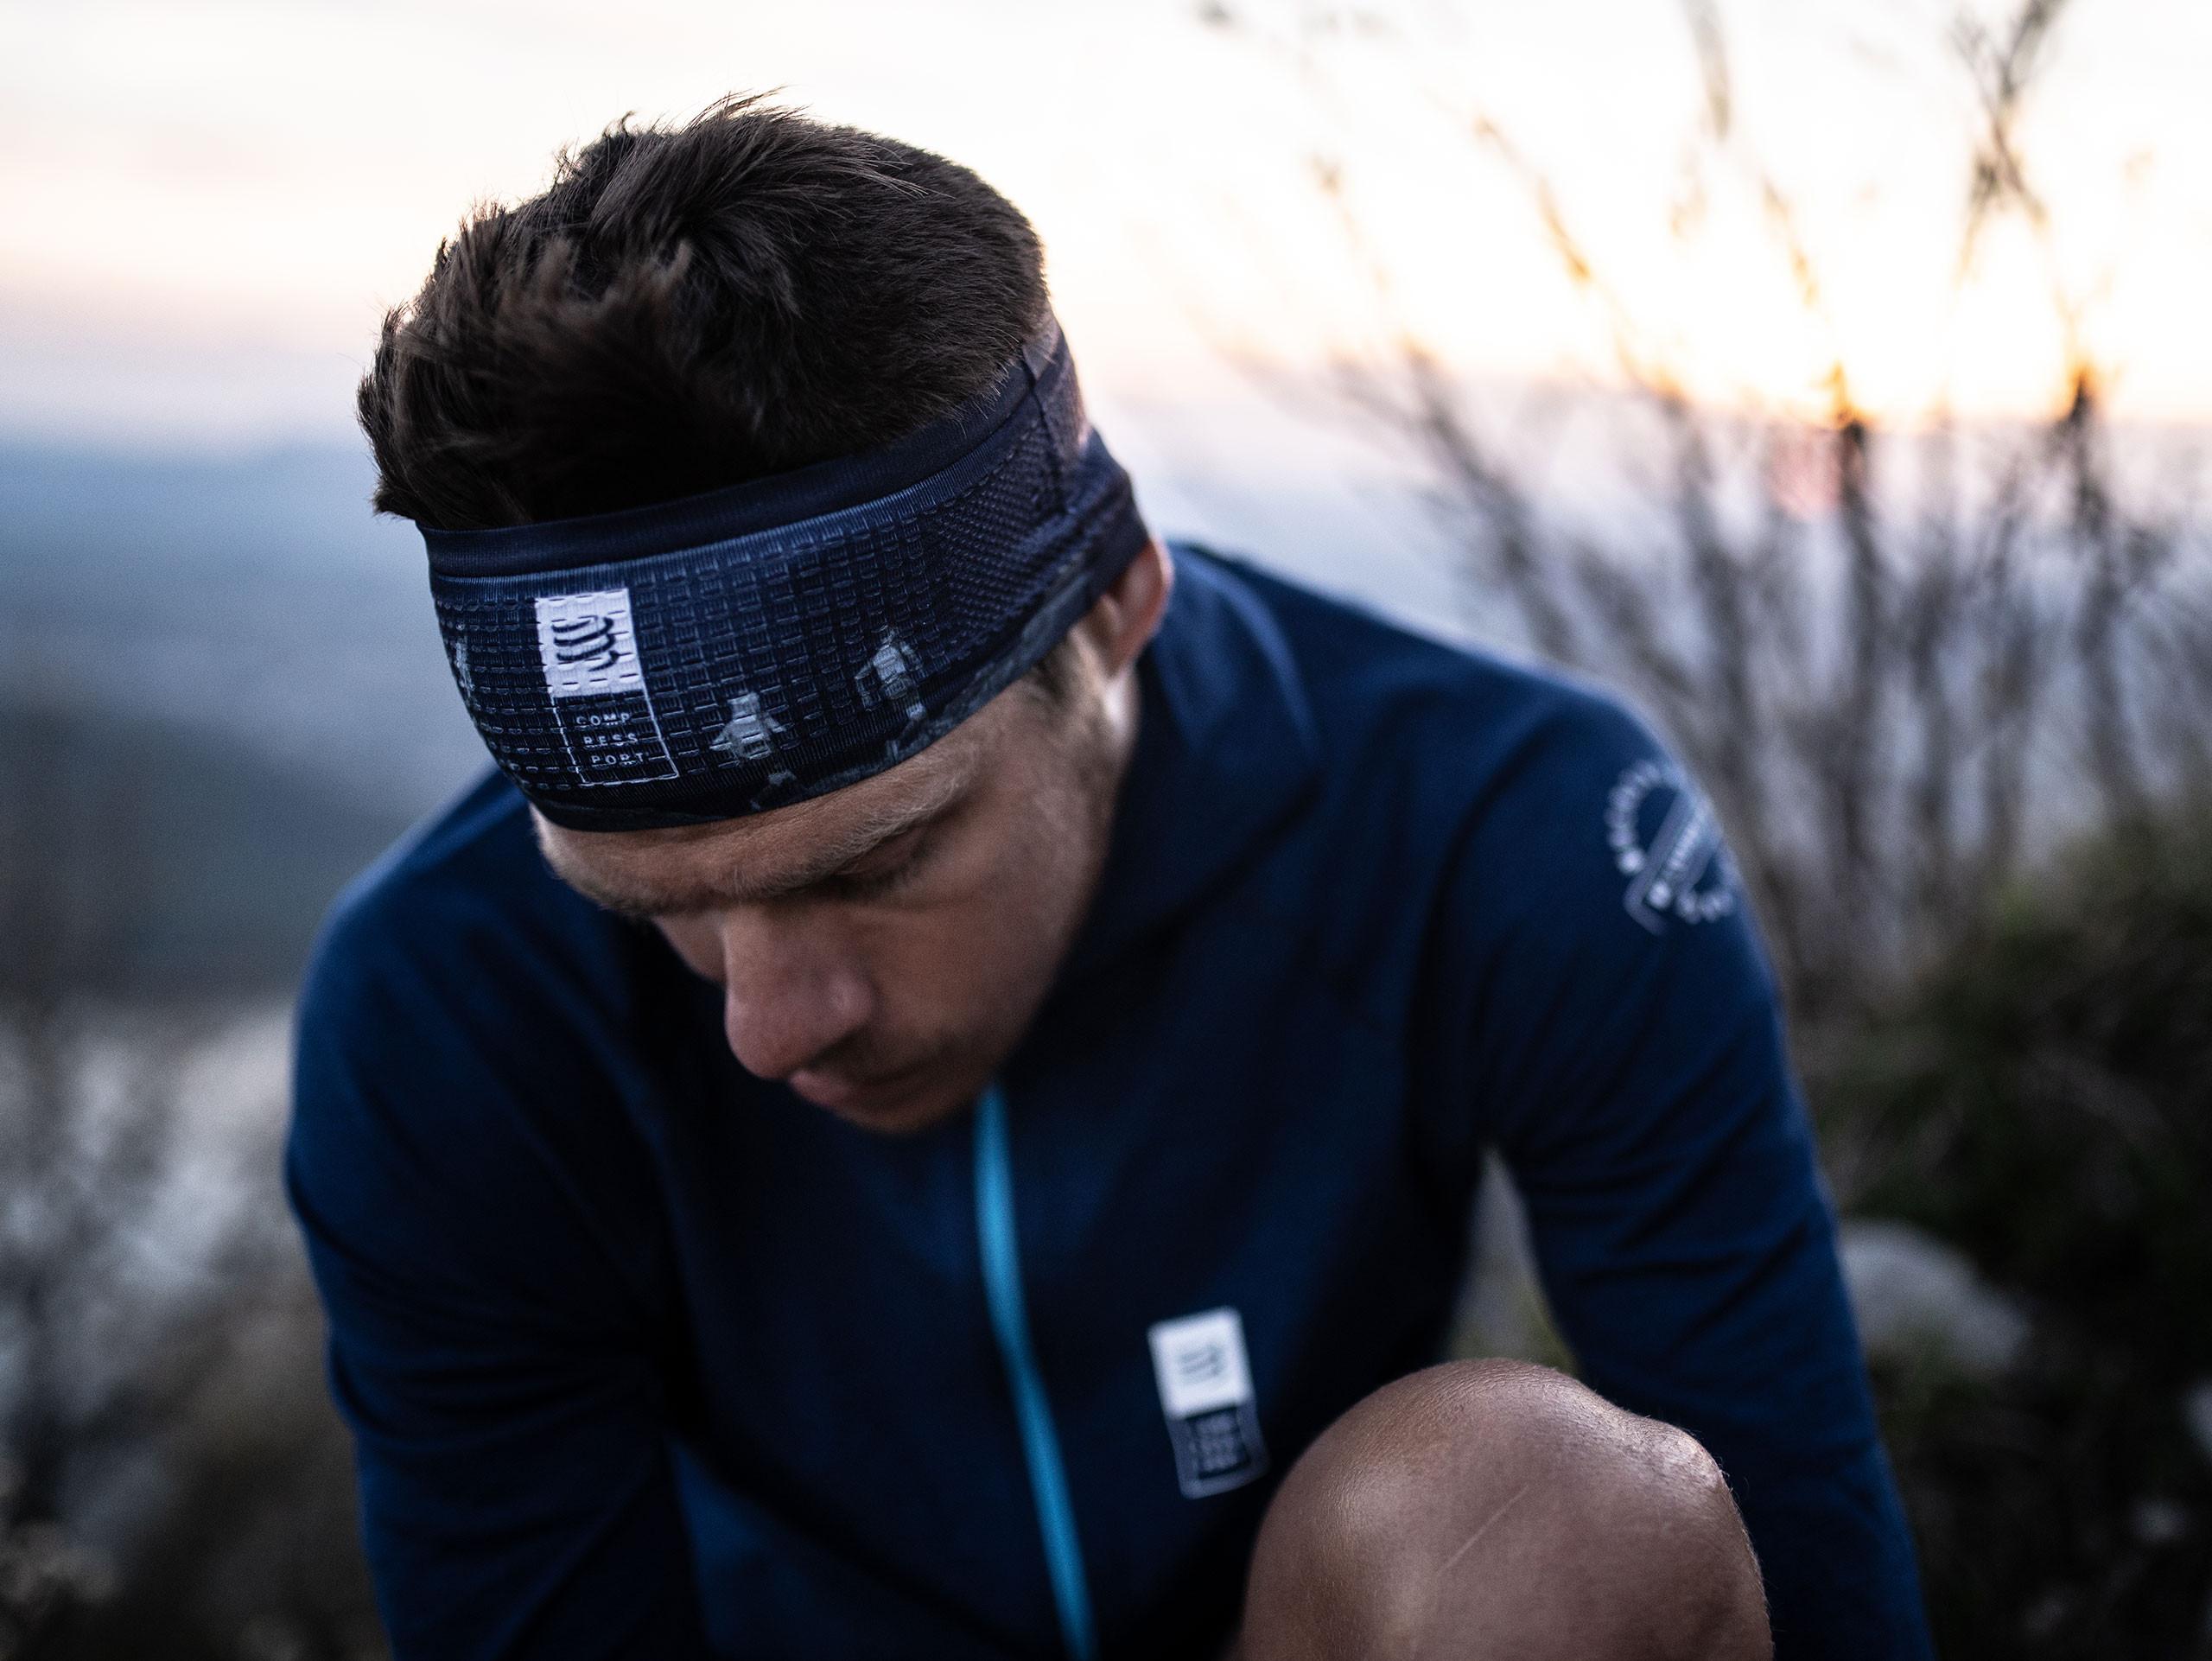 HeadBand On/Off - Mont Blanc 2019